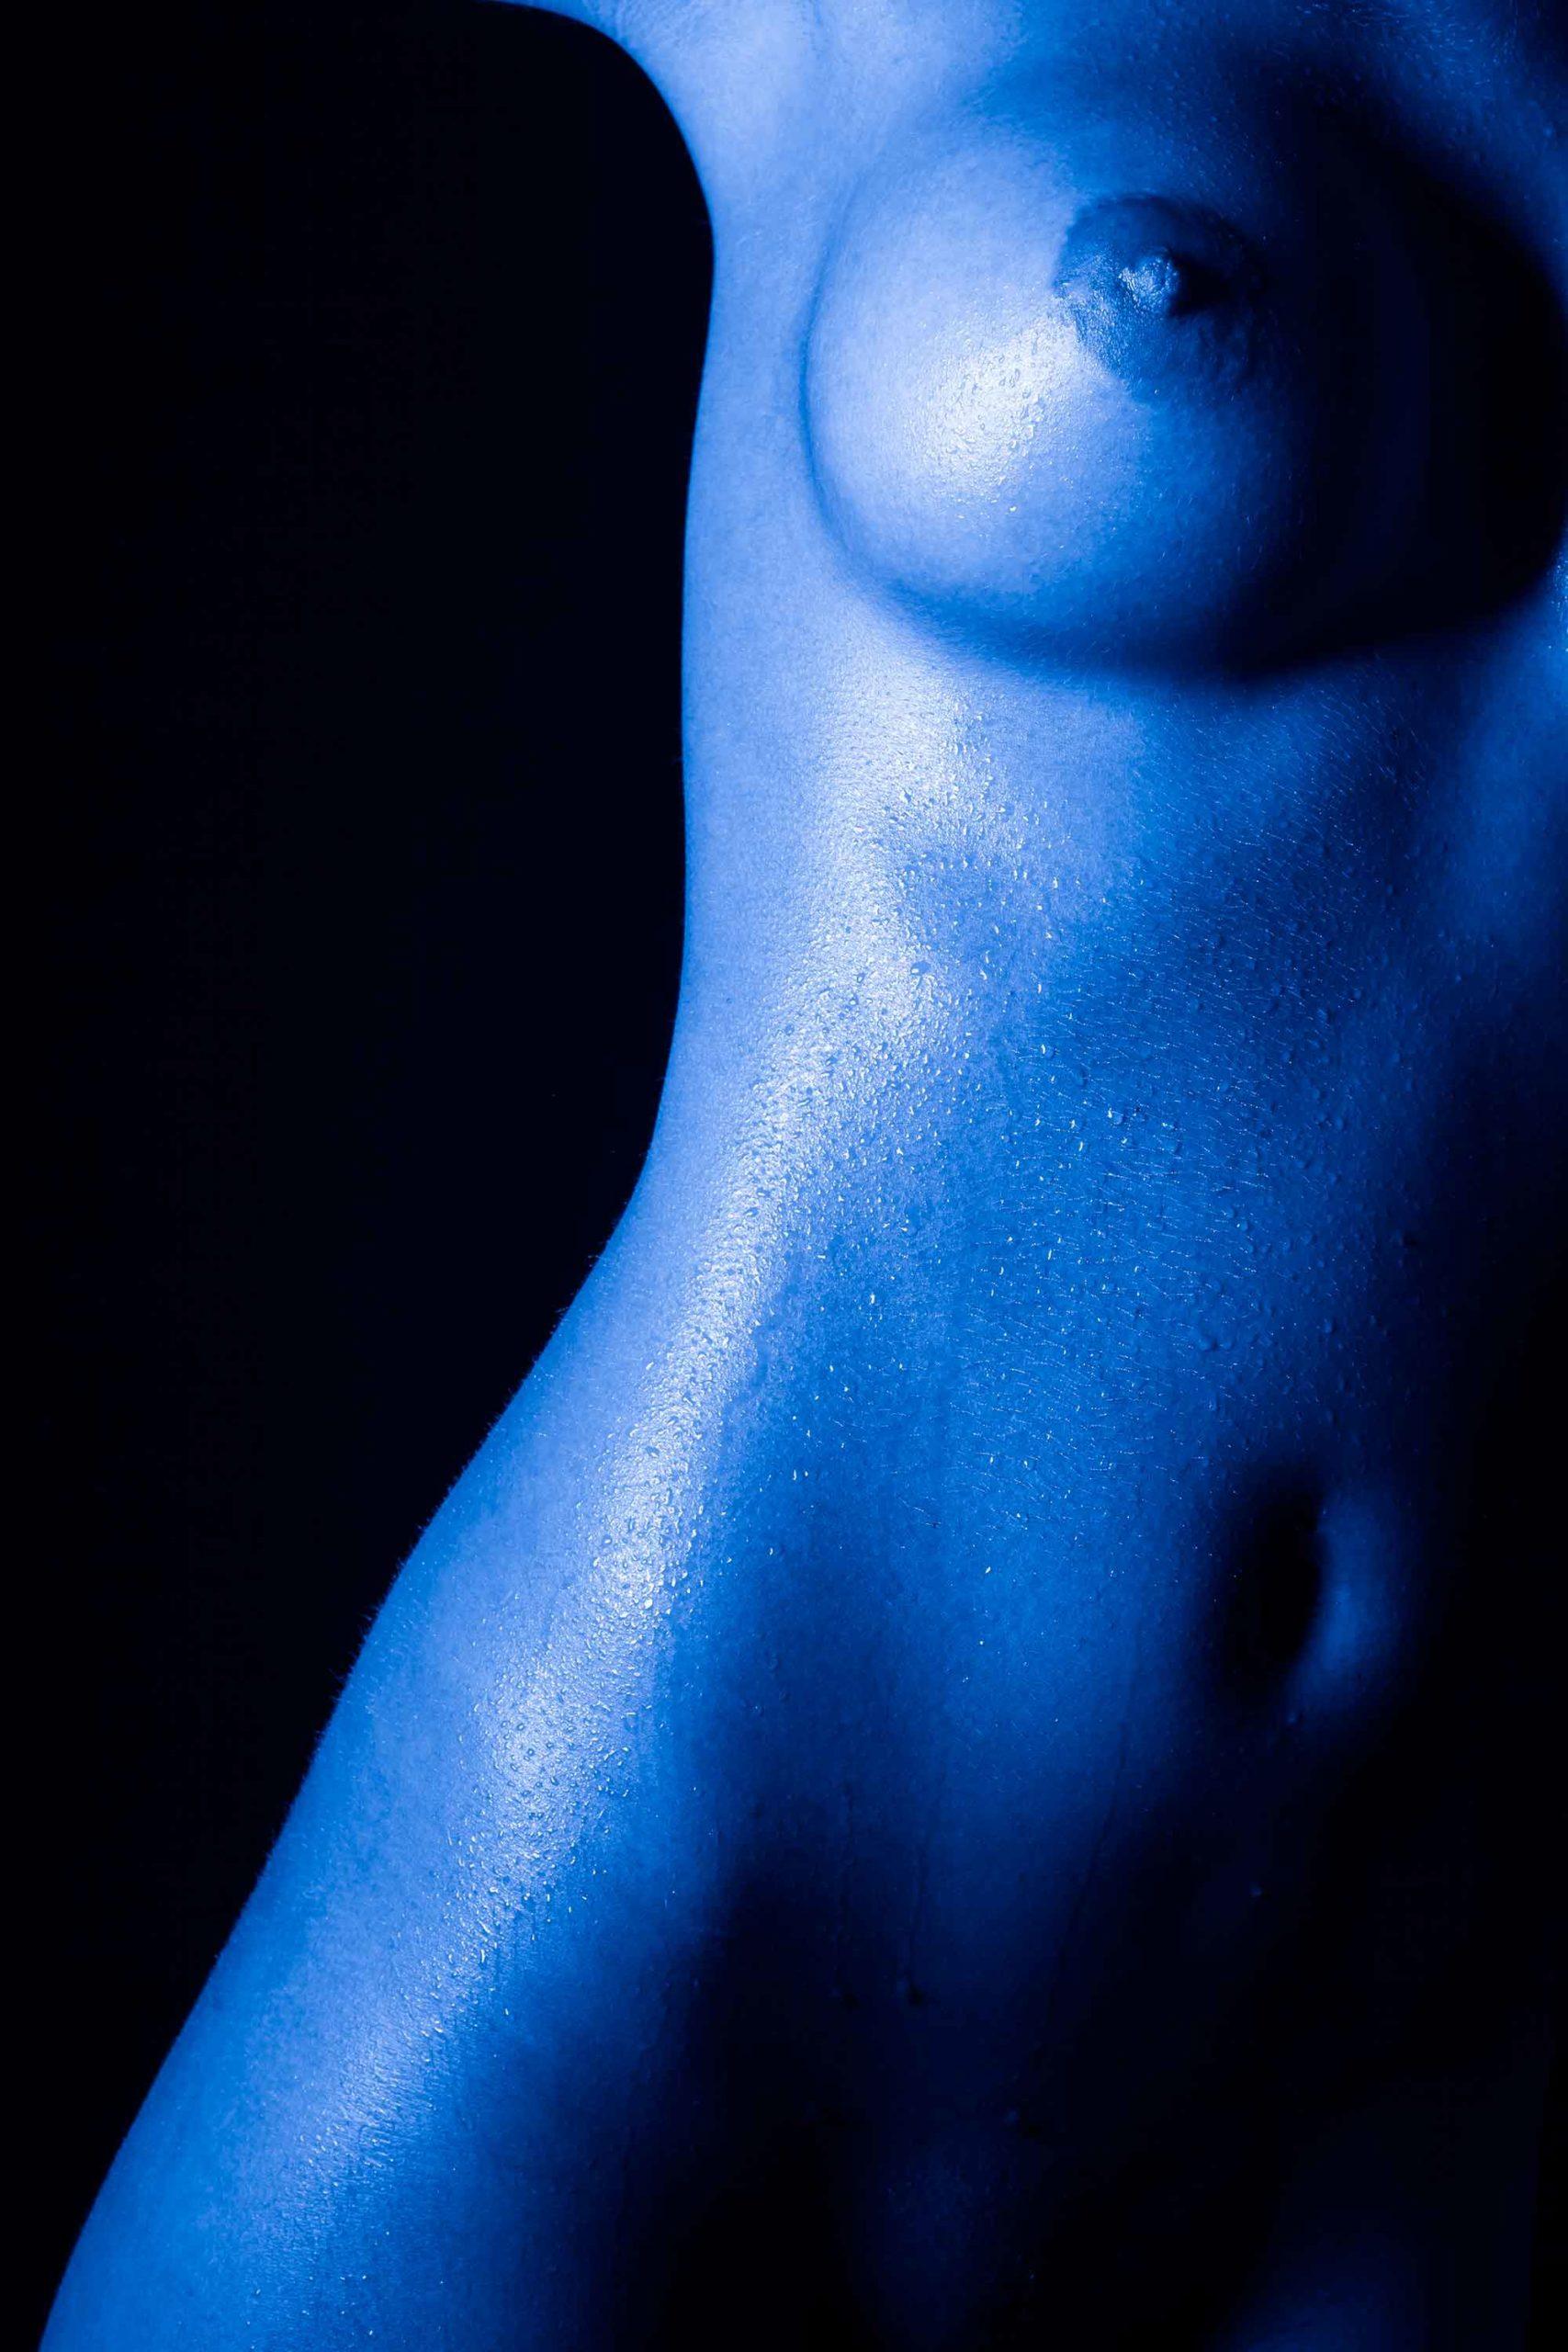 Naked Female Photograph